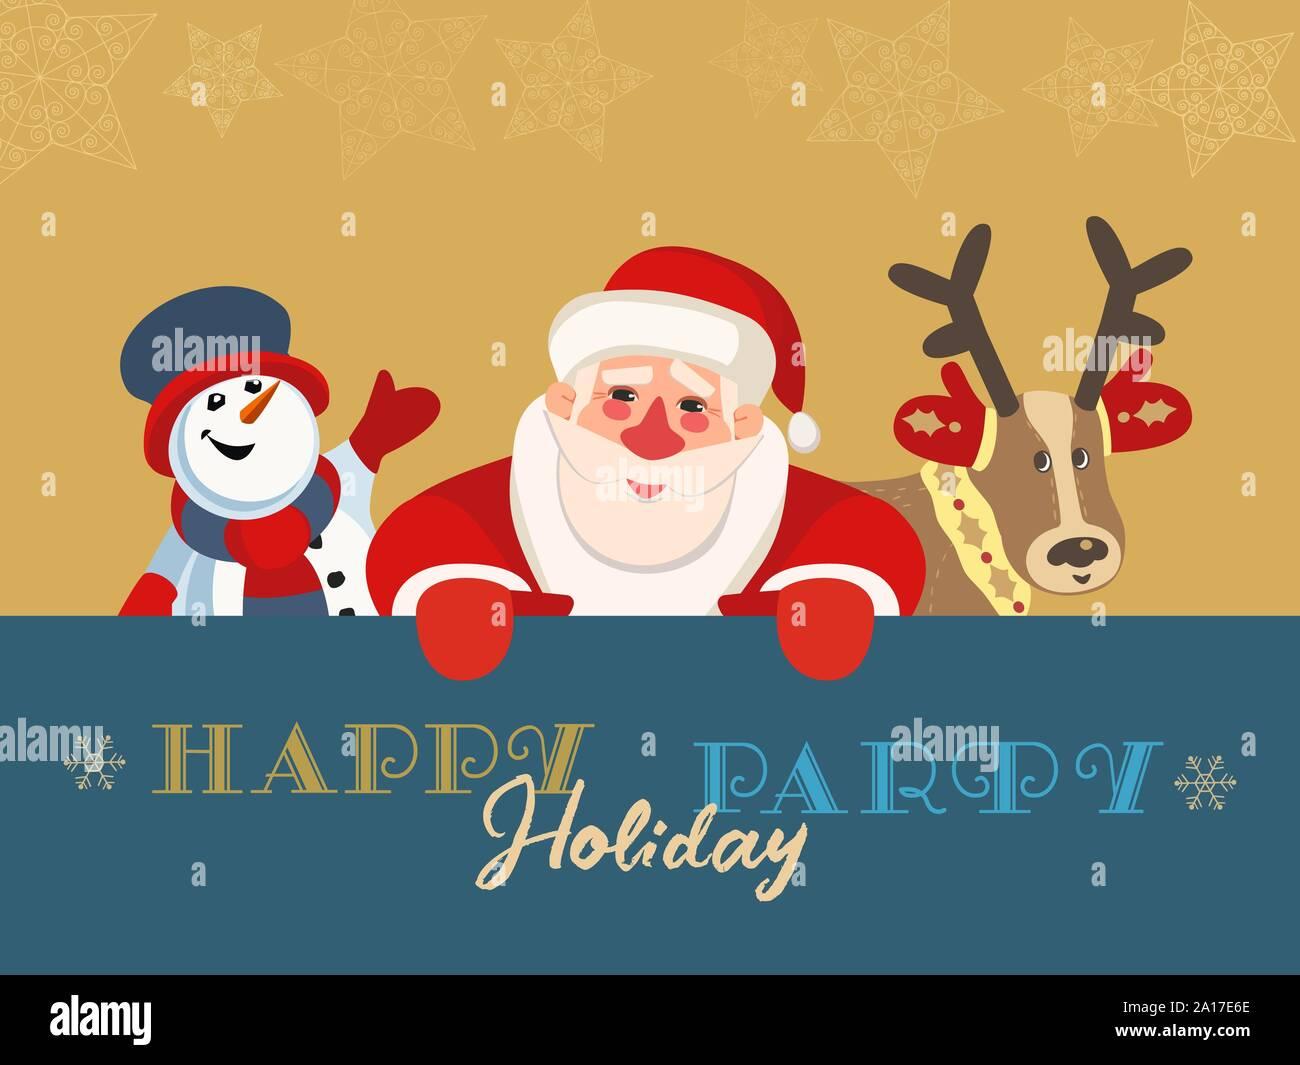 Christmas Celebration Cartoon Images.Hand Drawn Winter Season Holiday Party Flat Color Vector